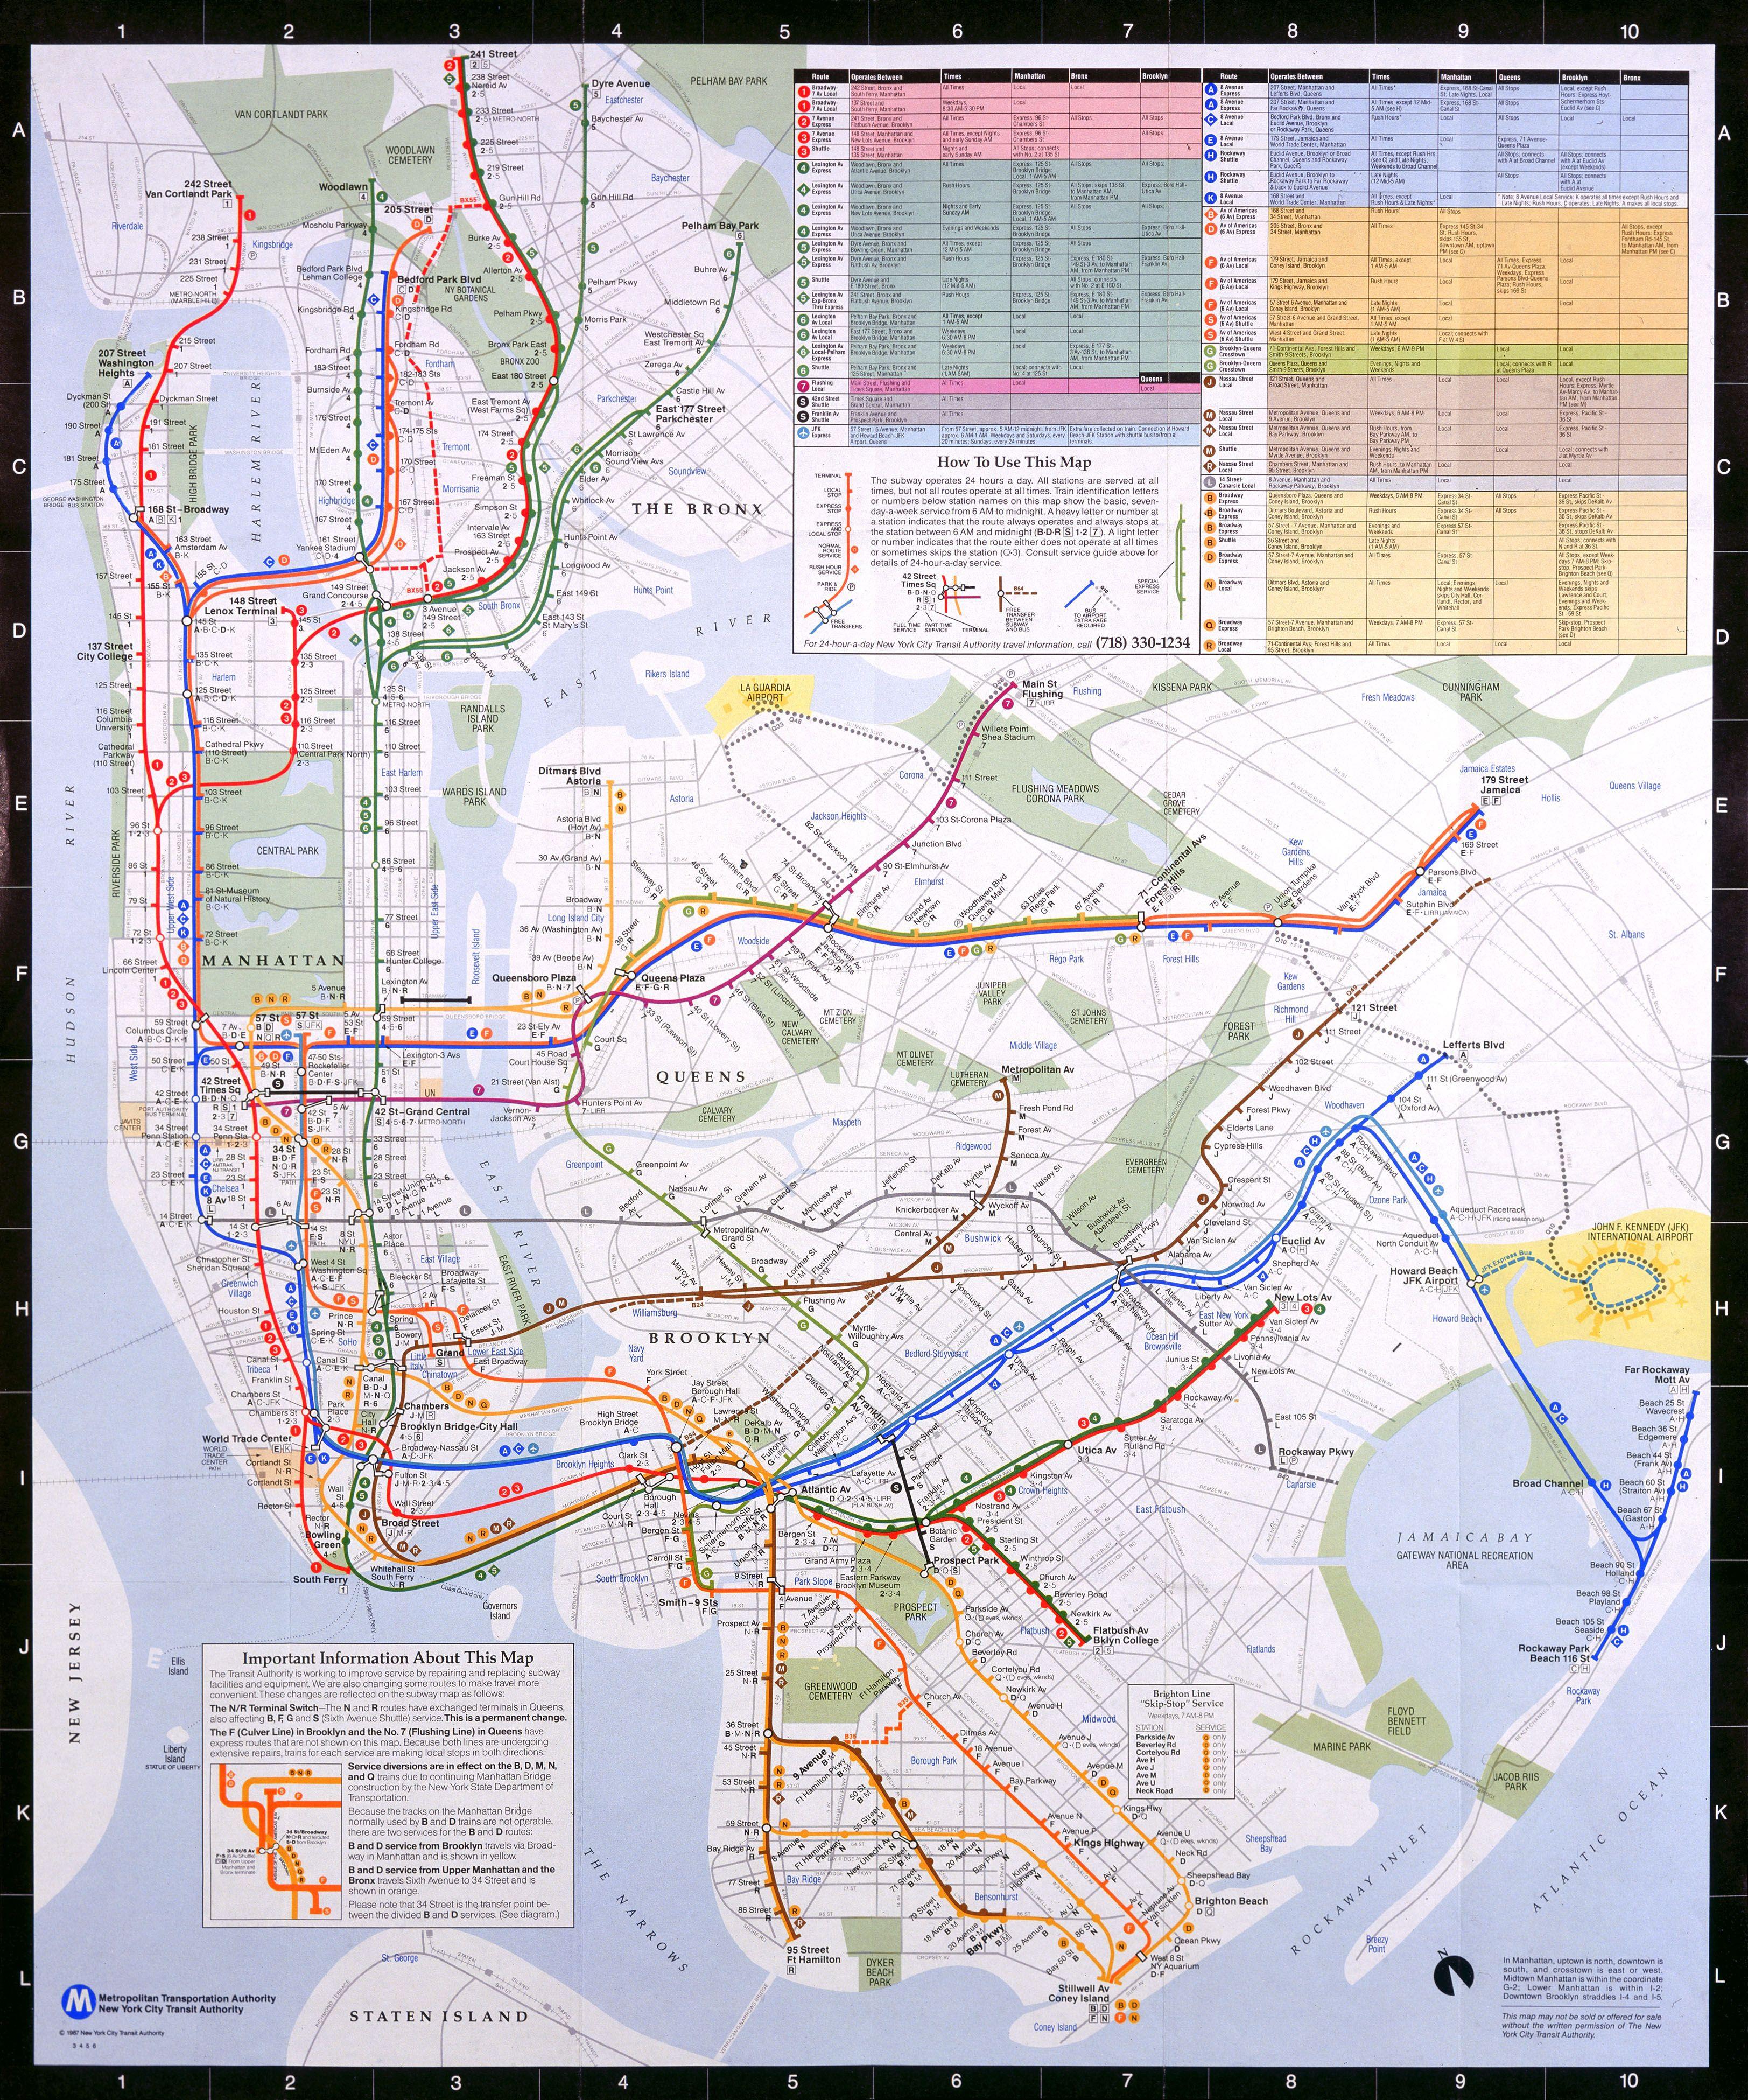 Chatham Square Subway Map.Ny Subway Map From 1979 The Art In Ny Transit System Subway Map